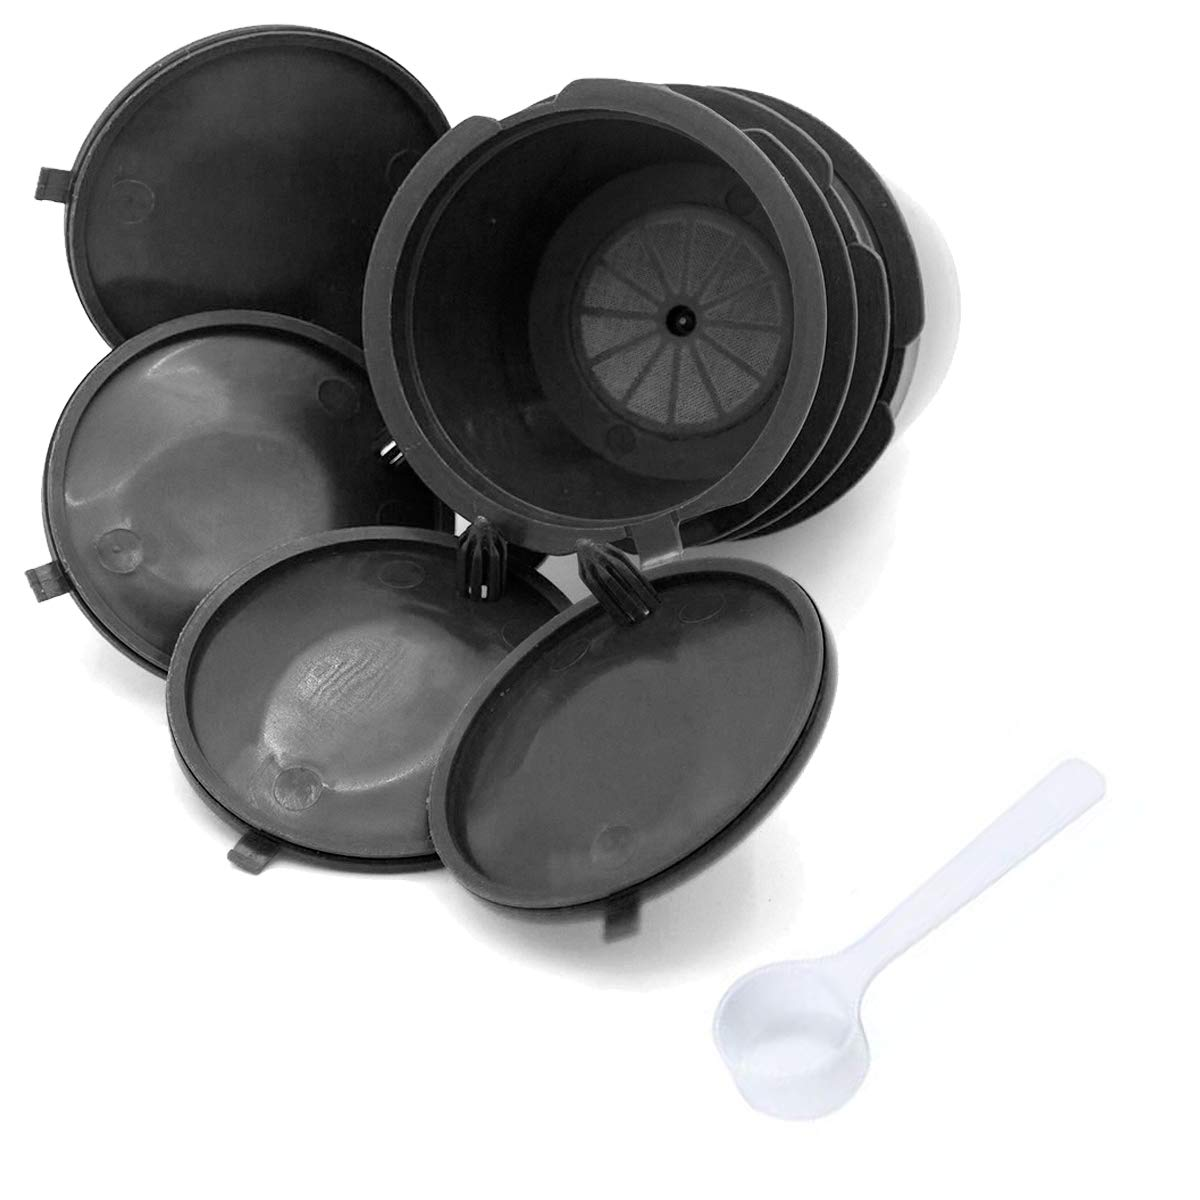 ALLOMN コーヒーカプセル BPAフリー 詰め替え可能 再利用可能 Dolce Gusto用 4個パック ブラック  Black+Spoon B07NJKPBP5